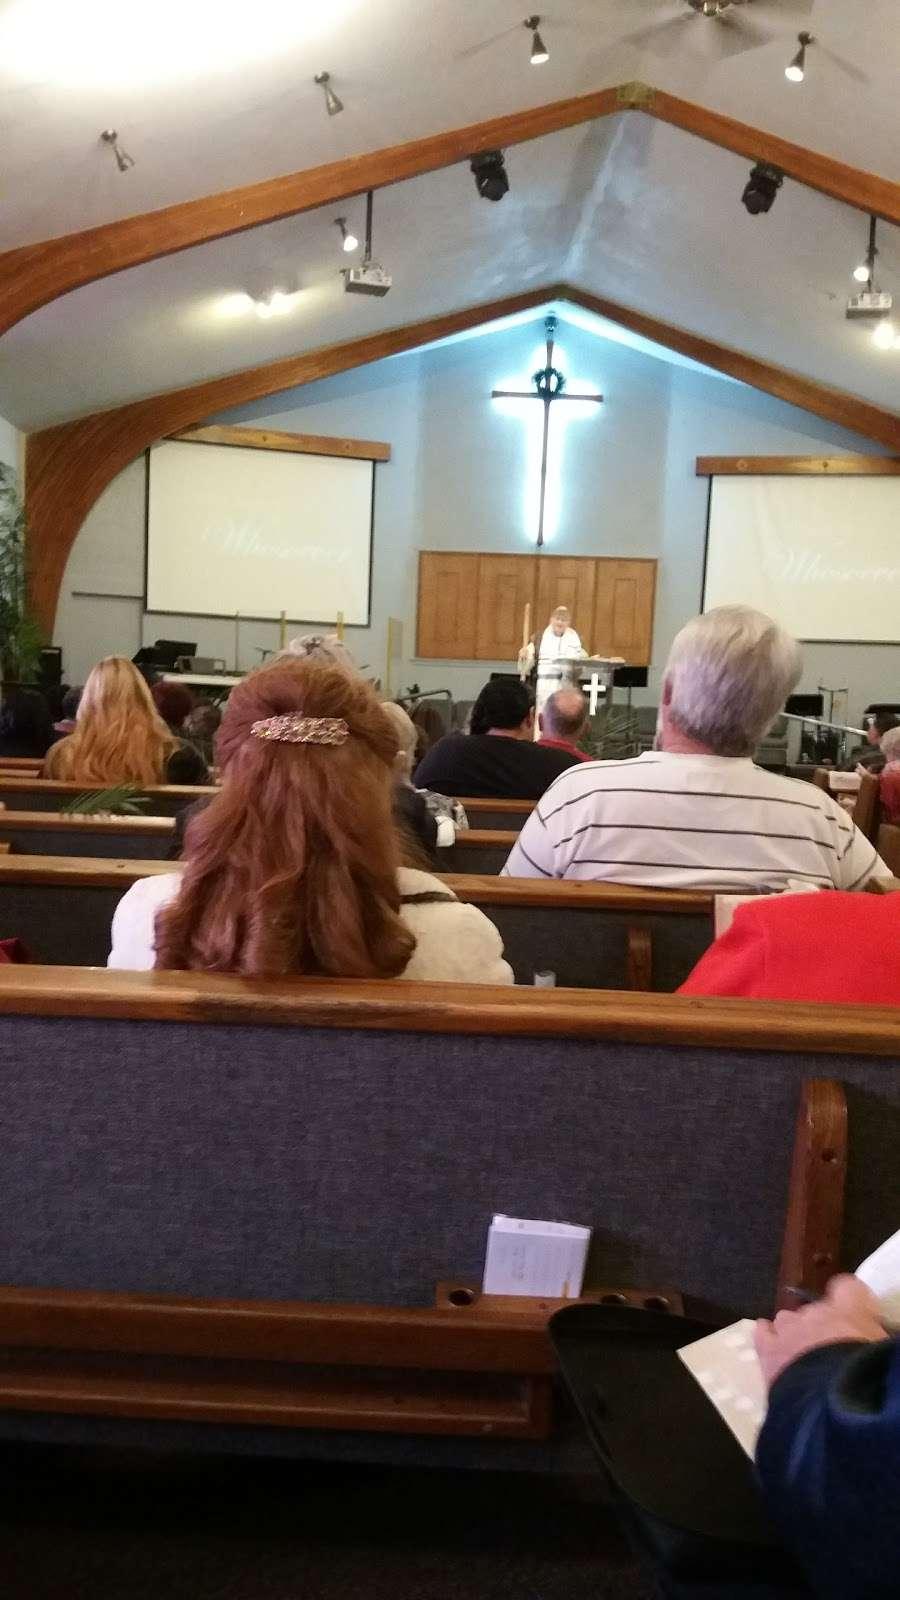 Church For Whosoever - church  | Photo 5 of 7 | Address: 18628 Seneca Rd, Apple Valley, CA 92307, USA | Phone: (760) 242-3191